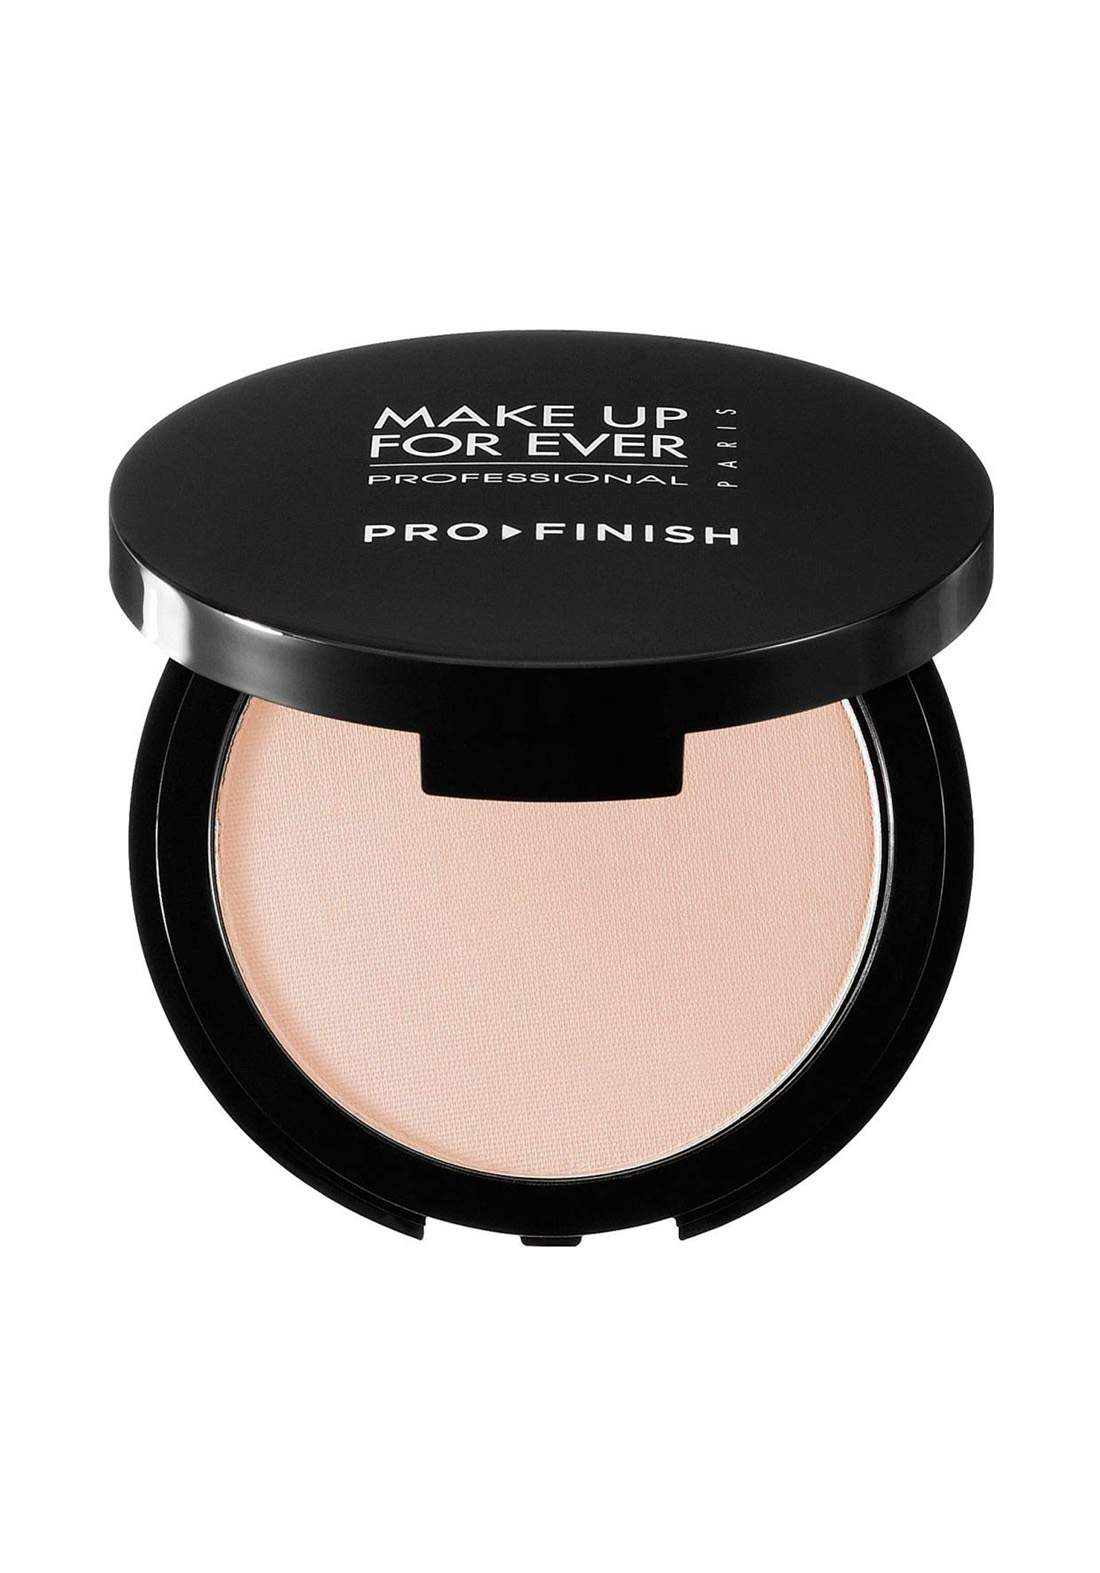 Make up for Ever Pro Finish Multi Use Powder Foundation 110 Pink 10g Womens باودر